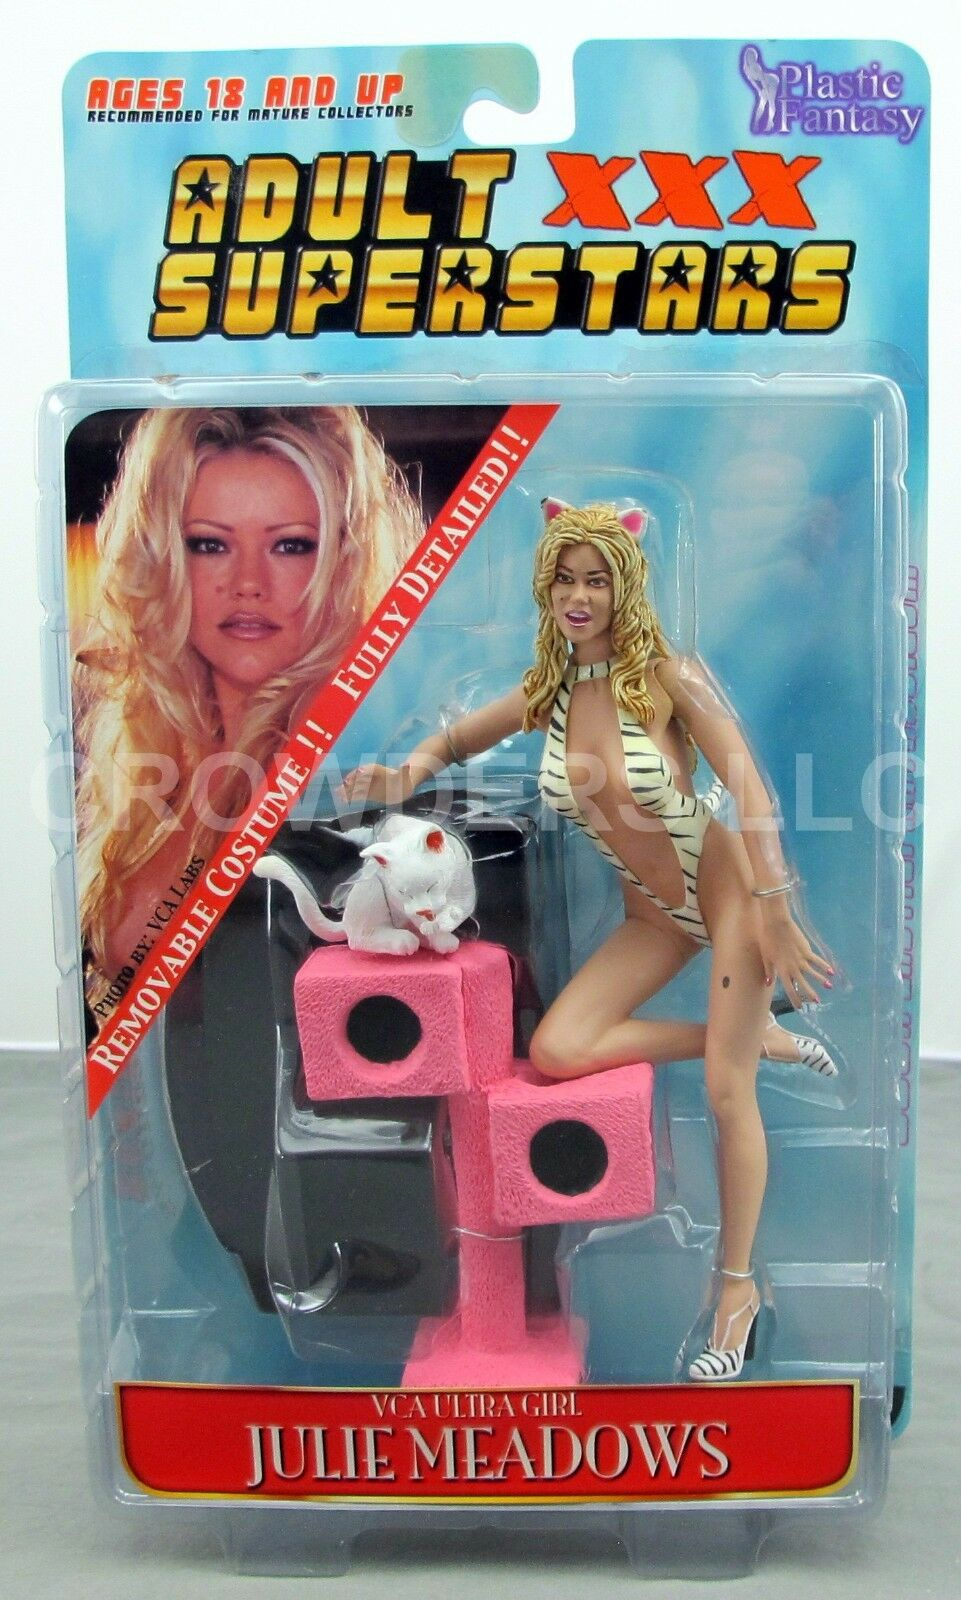 Plastic Fantasy Adult XXX Superstars Superstars Superstars JULIE MEADOWS Remove Costume Full Detail a88770